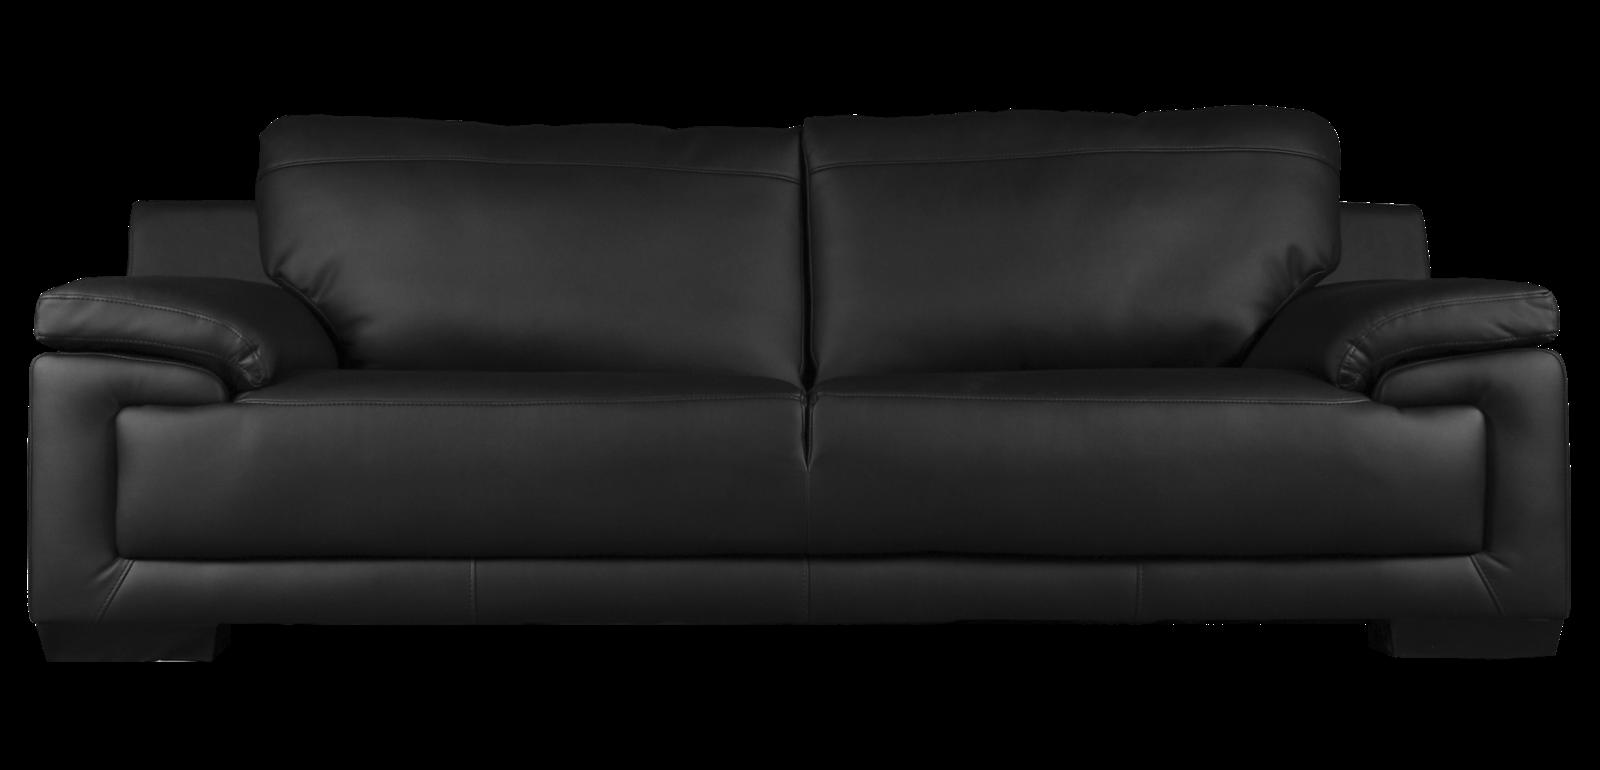 Sofa HD PNG - 118087